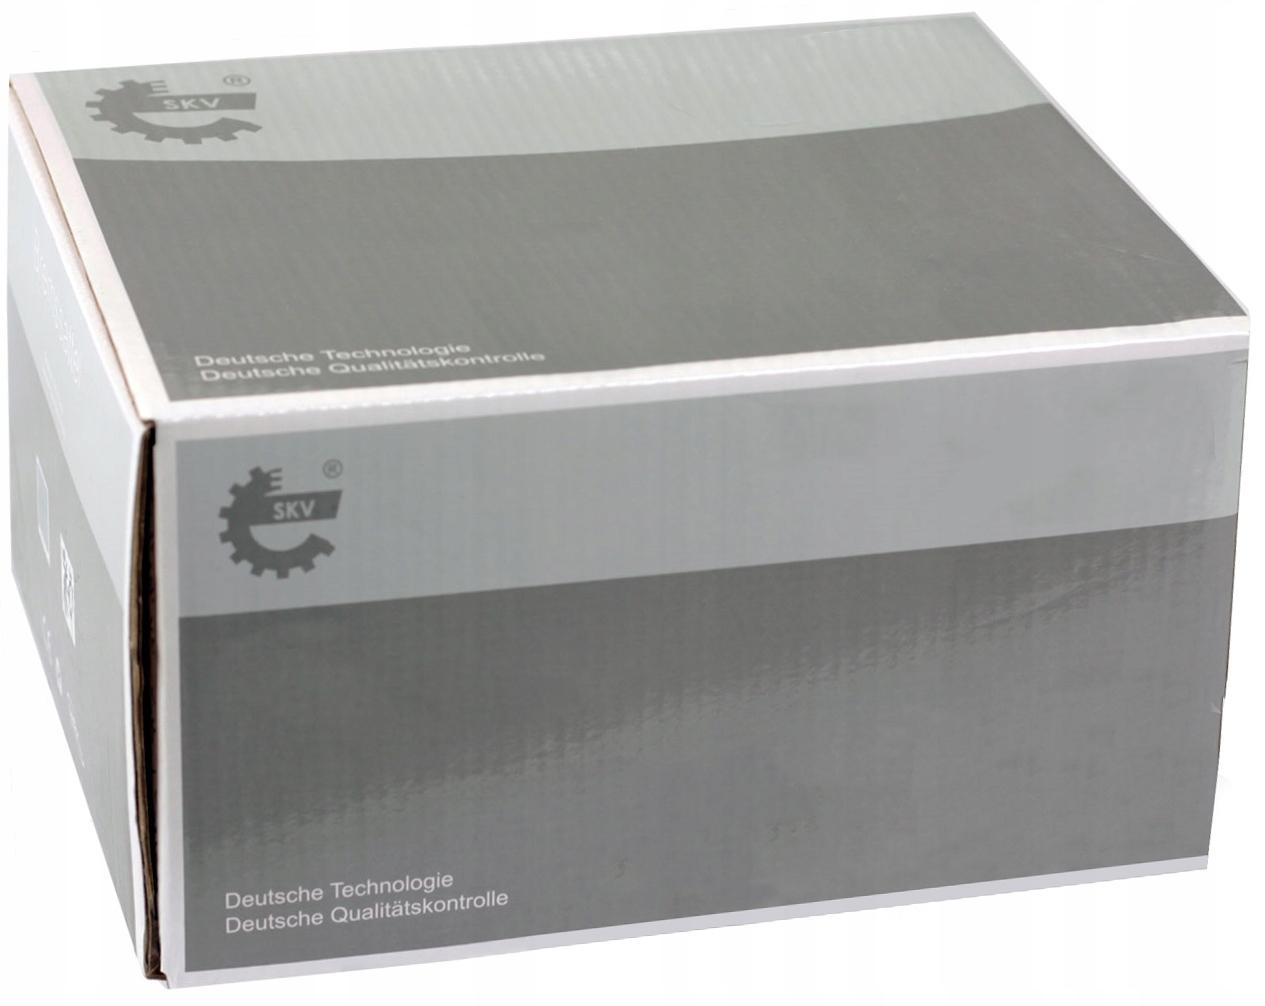 датчик температуры выхлопных газов skv 30skv050